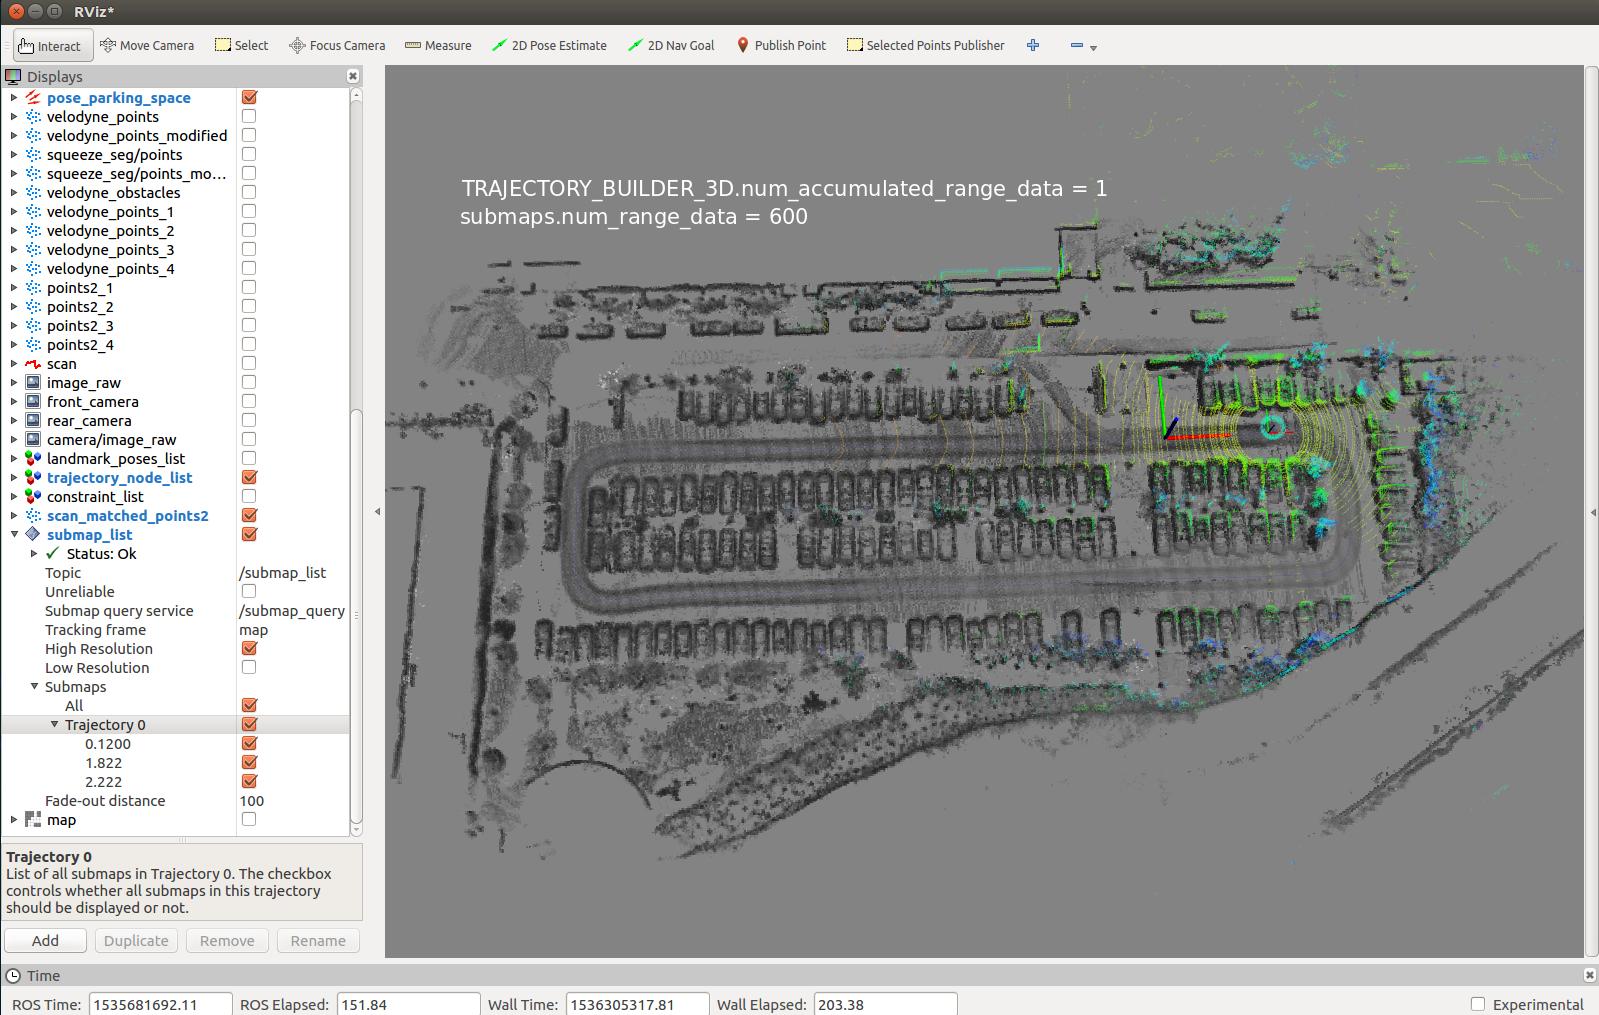 few INTER Constraints when doing Pure Localization 3D SLAM